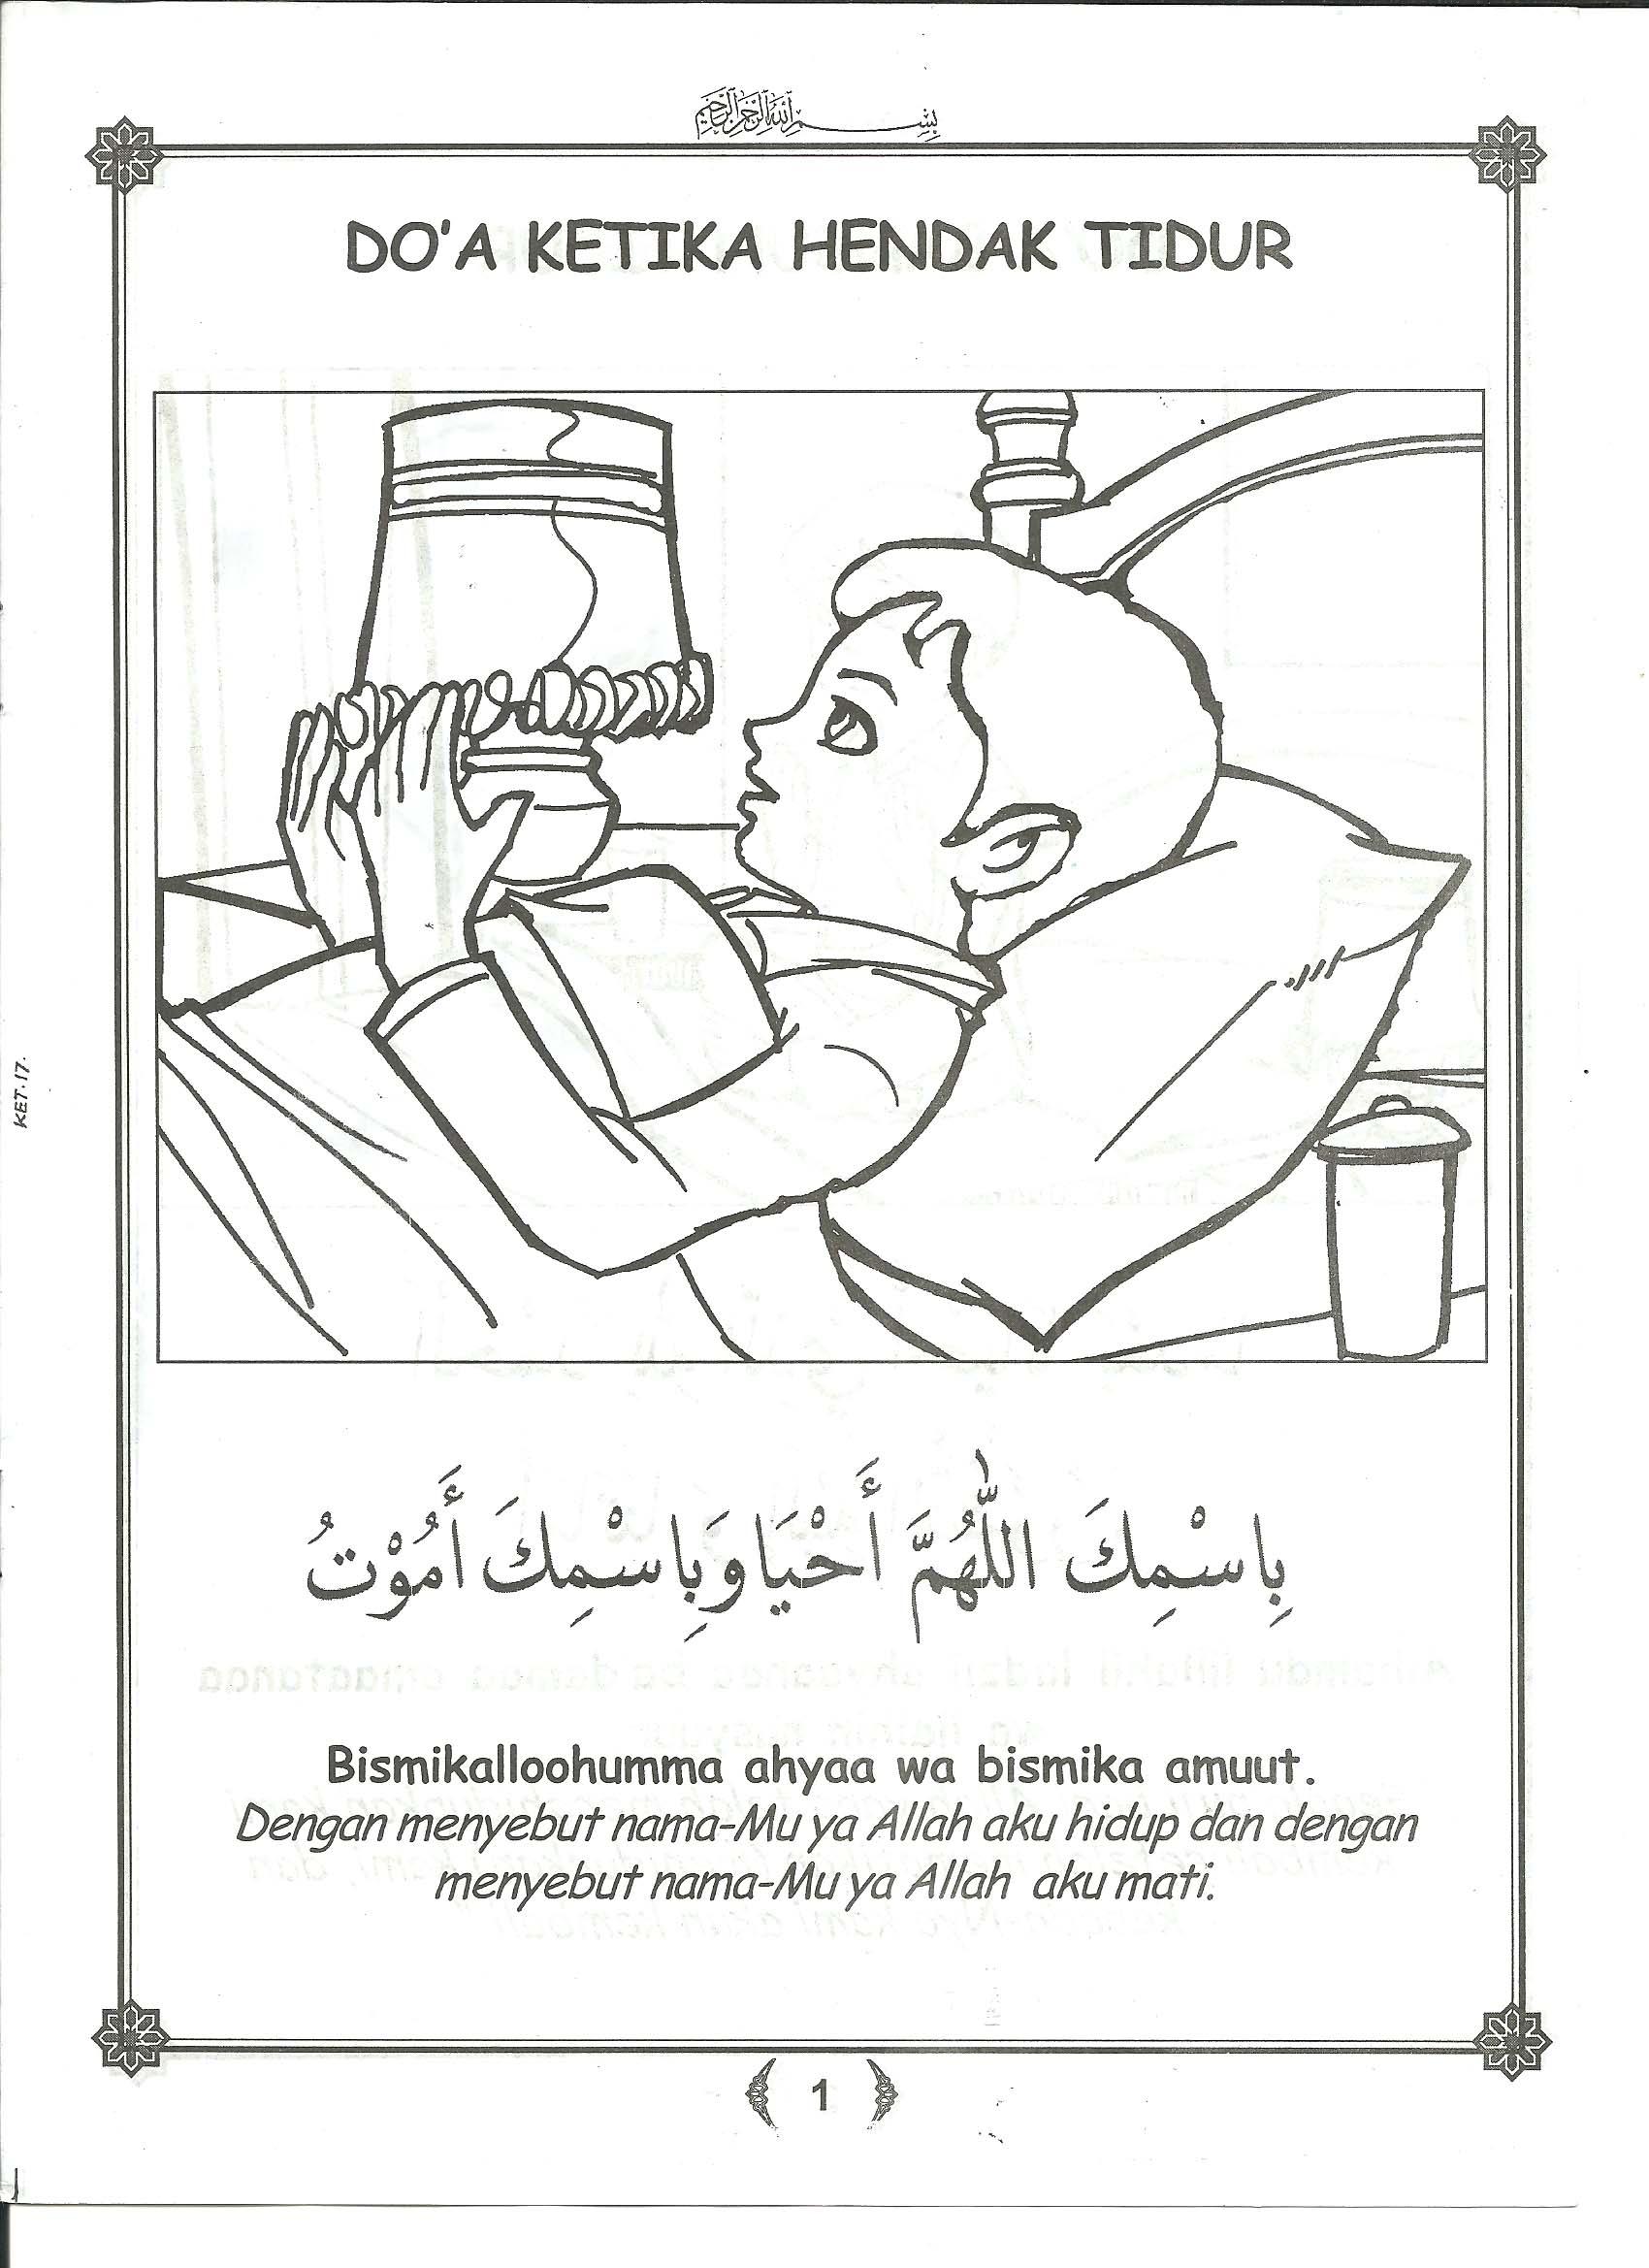 belajar mewarnai doa harian gambar 11